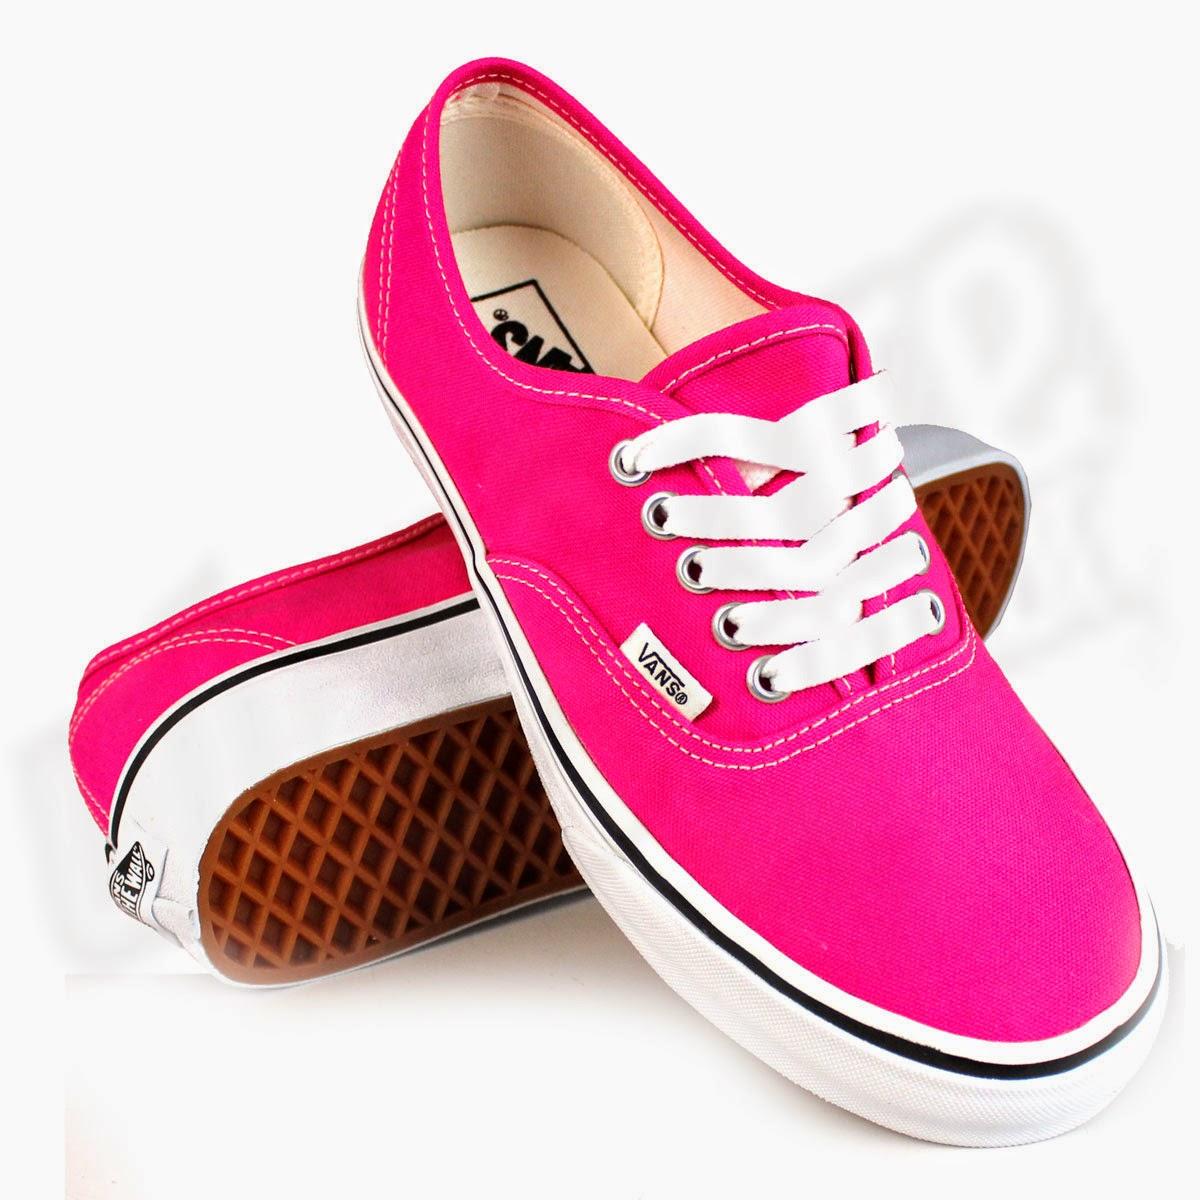 Adolescentes Mimadas: Sapatos Vans Femininos